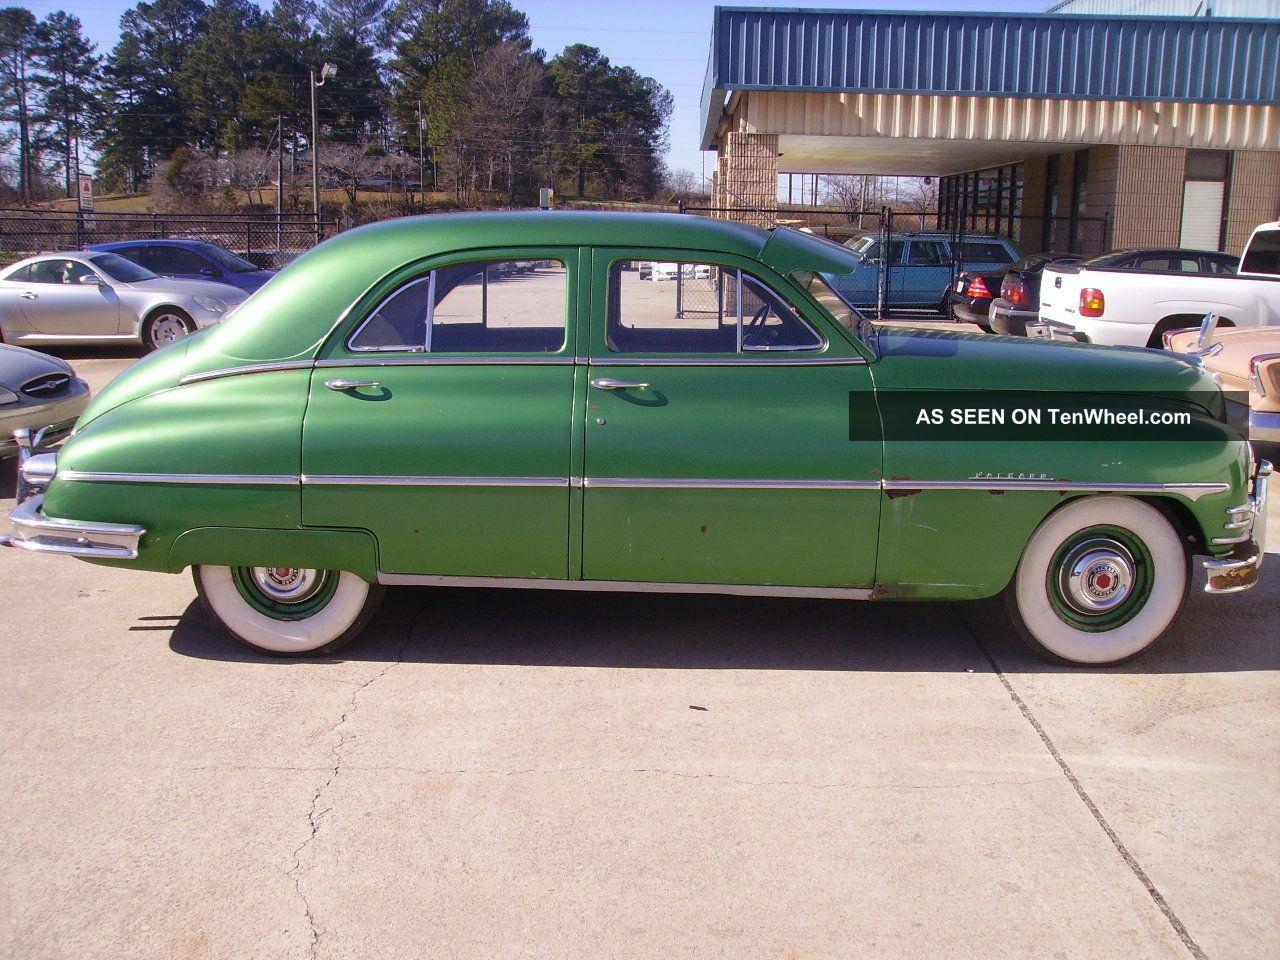 Packard Door Sedan Barn Find All Look Lgw on 1950 Chrysler Straight 8 Engine